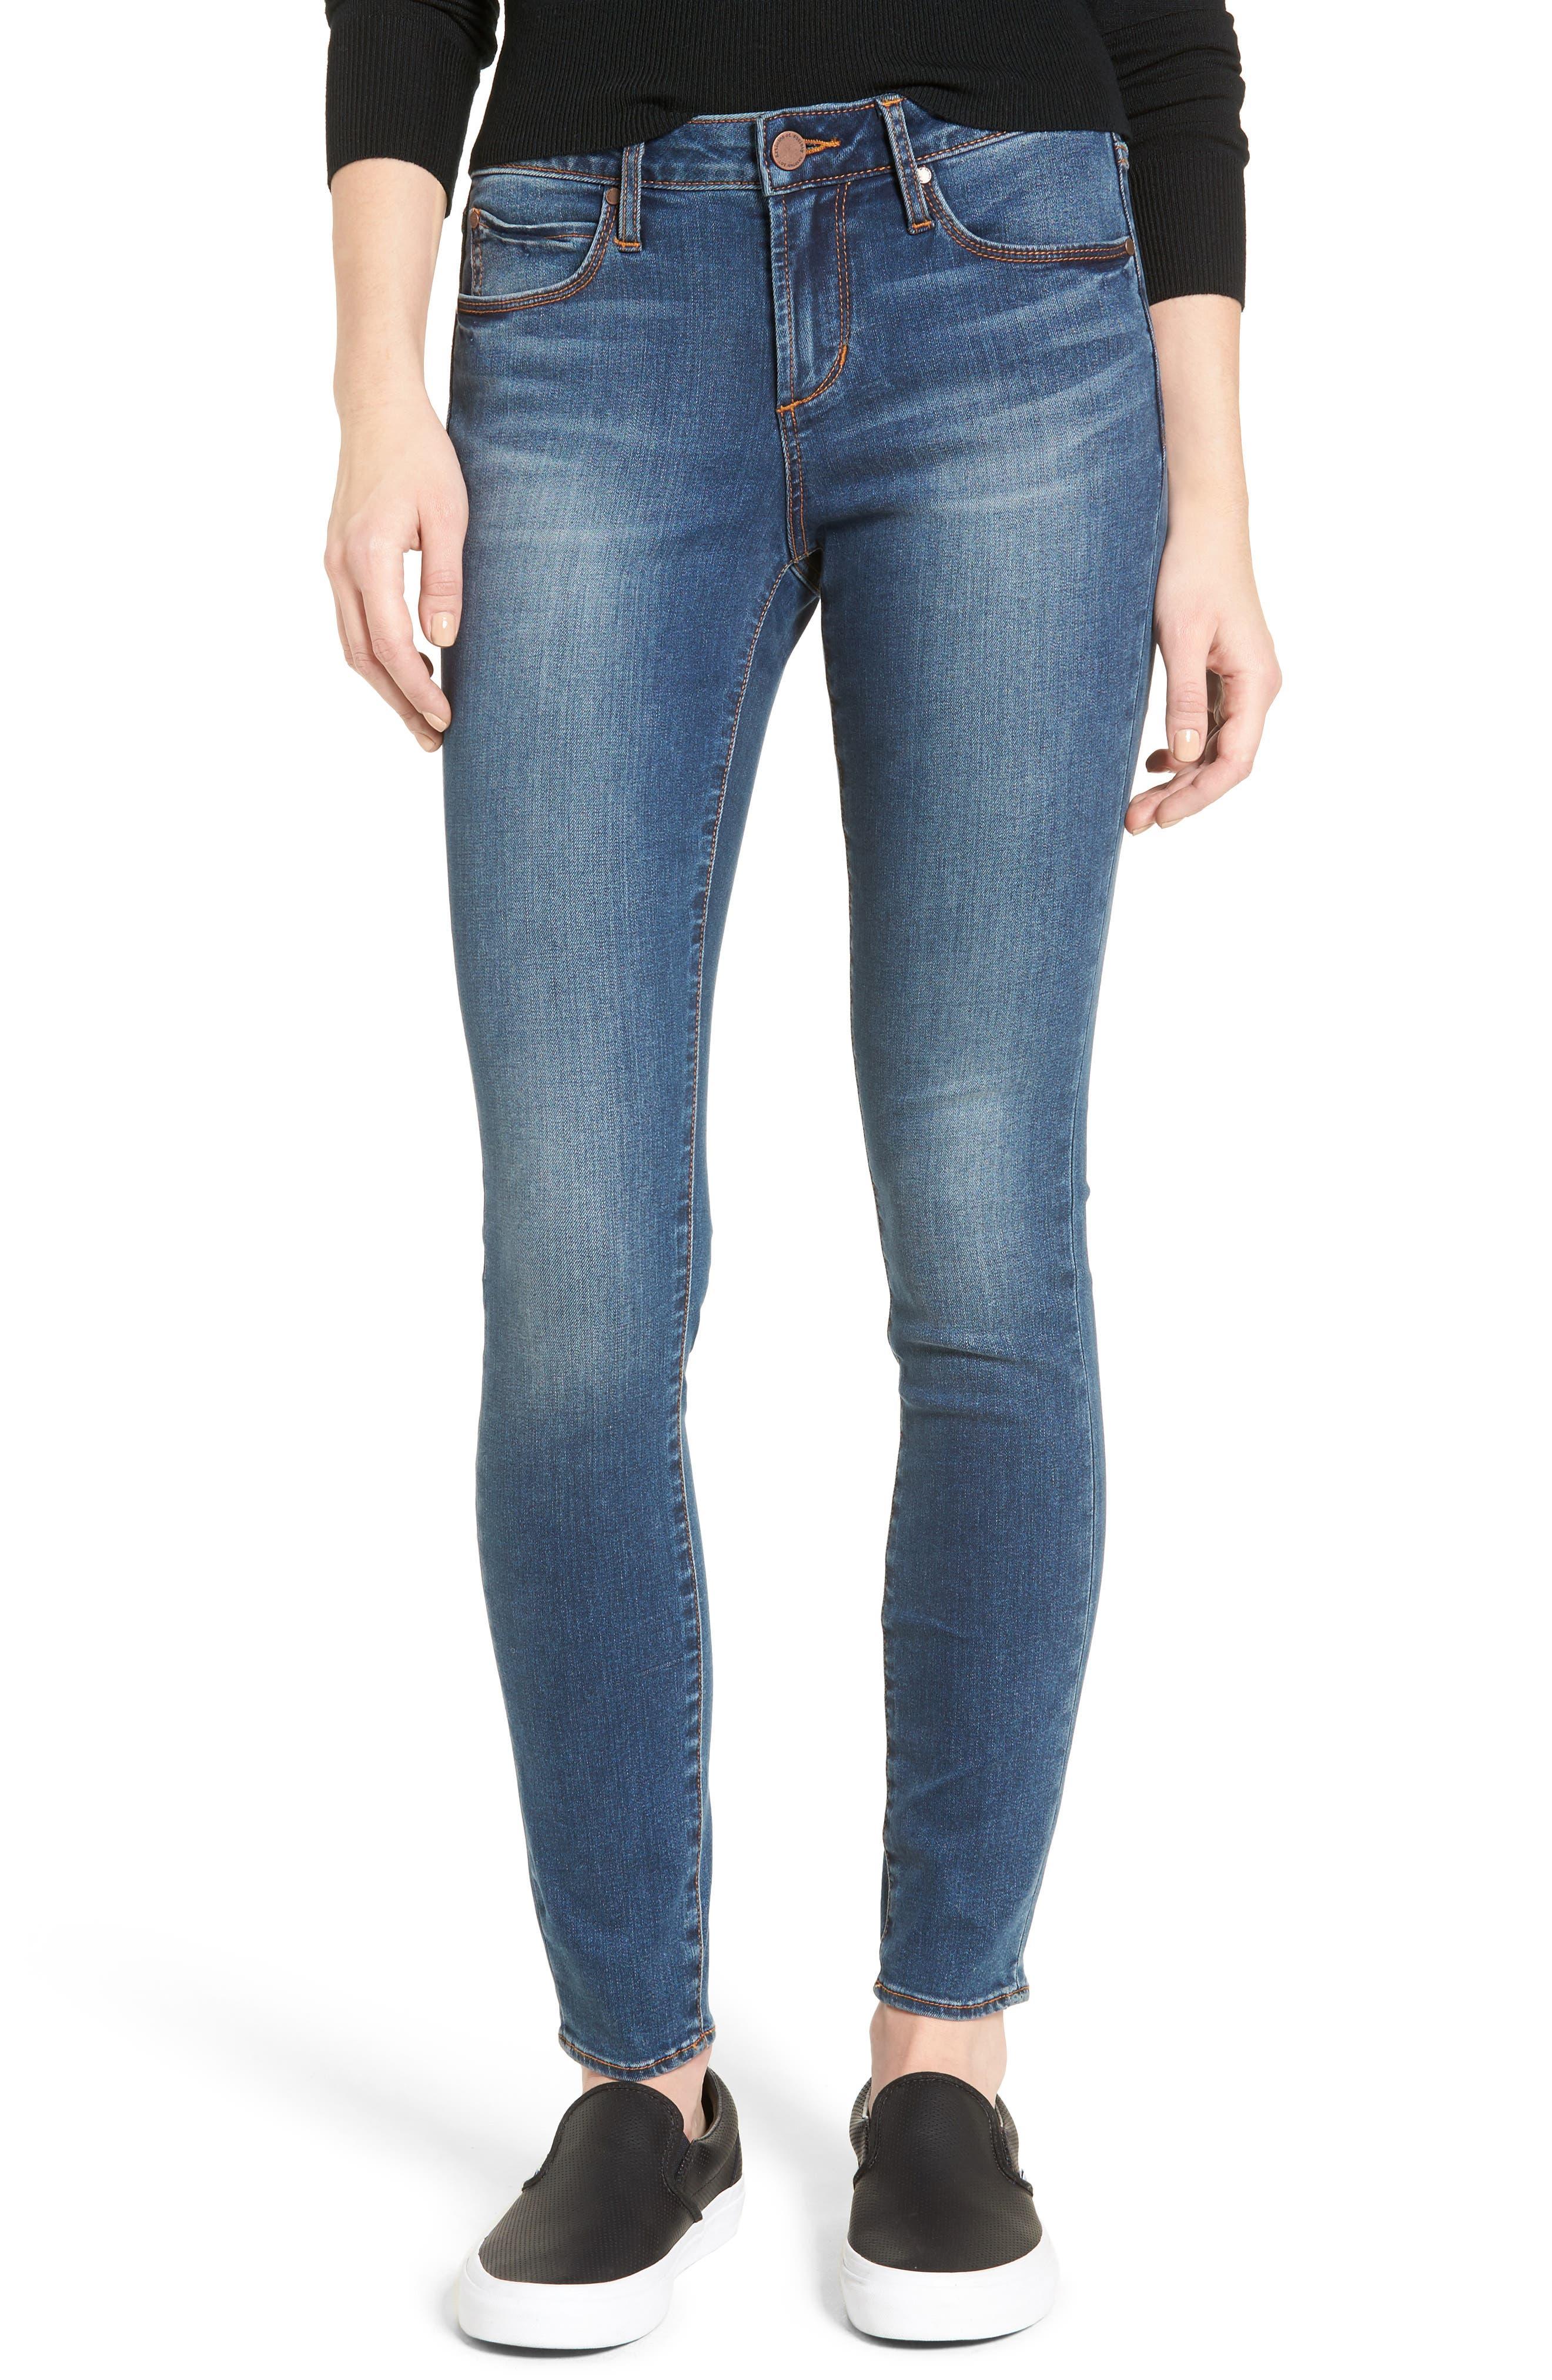 Main Image - Articles of Society Sarah Skinny Jeans (Bancroft)